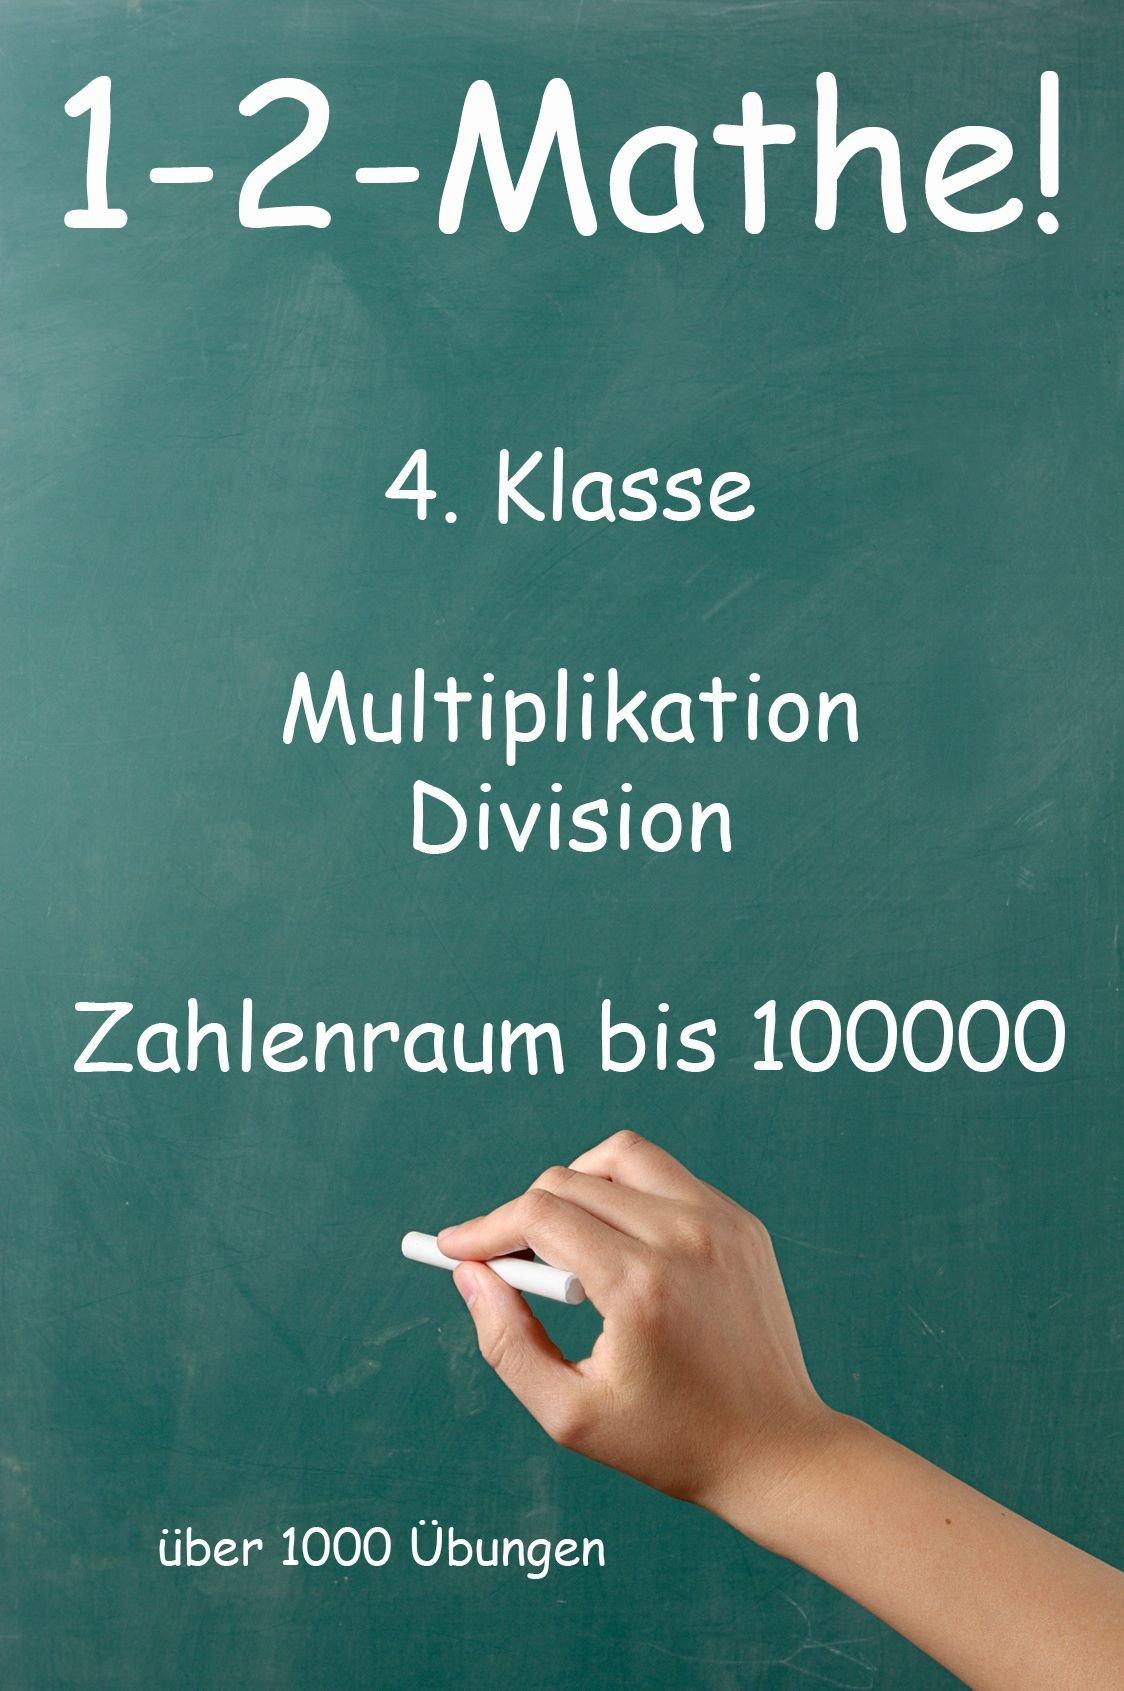 1-2-Mathe! - 4. Klasse - Addition, Subtraktion, Zahlenraum bis ...